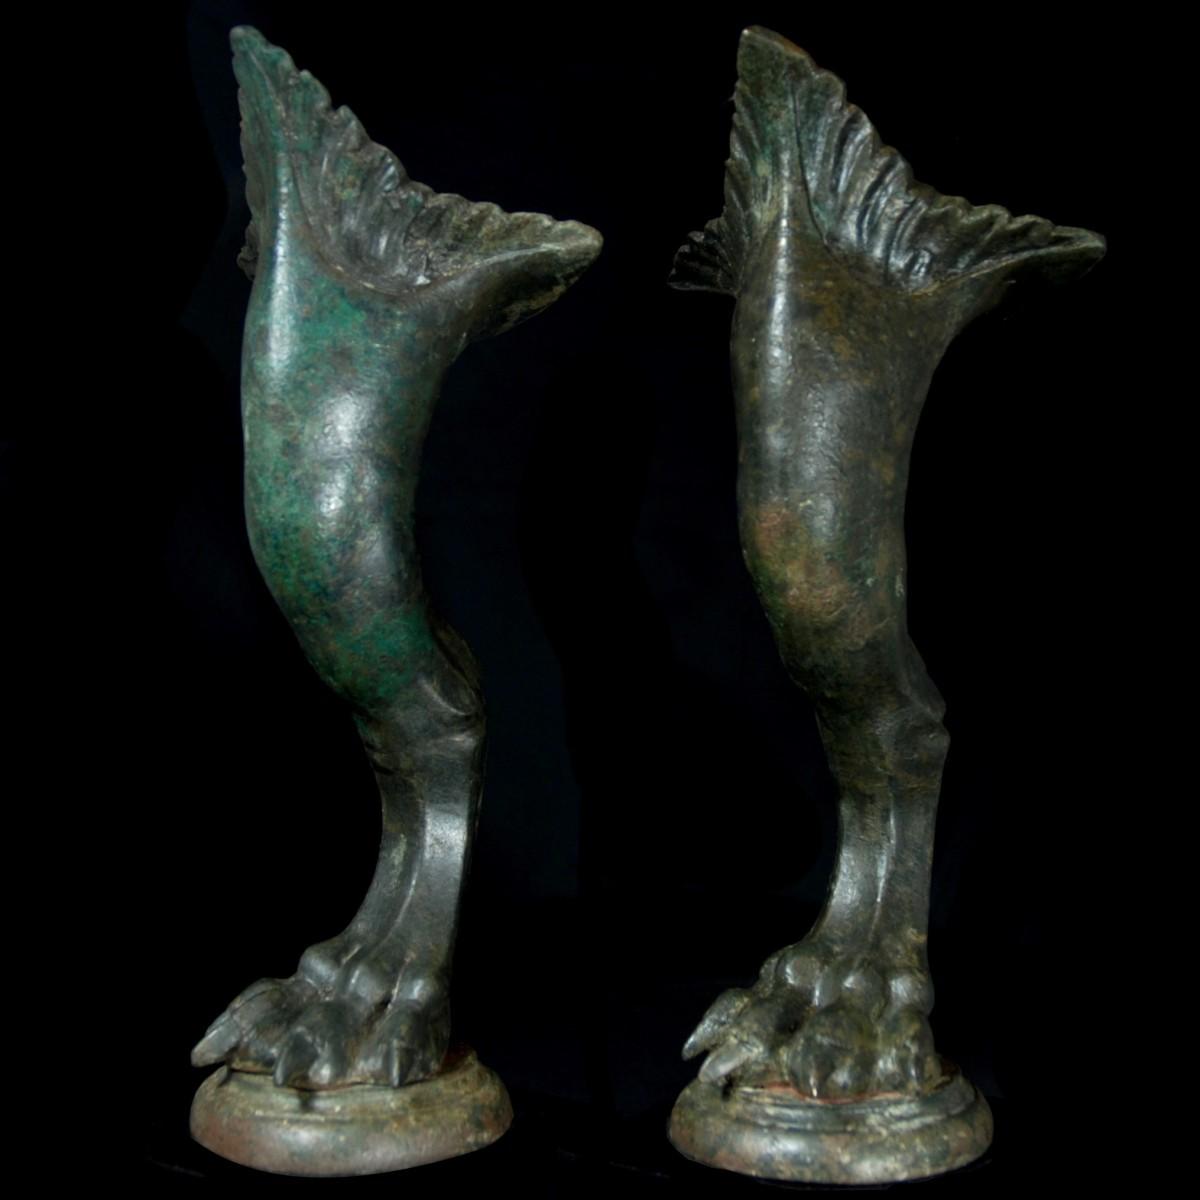 Monumental Roman furniture legs left